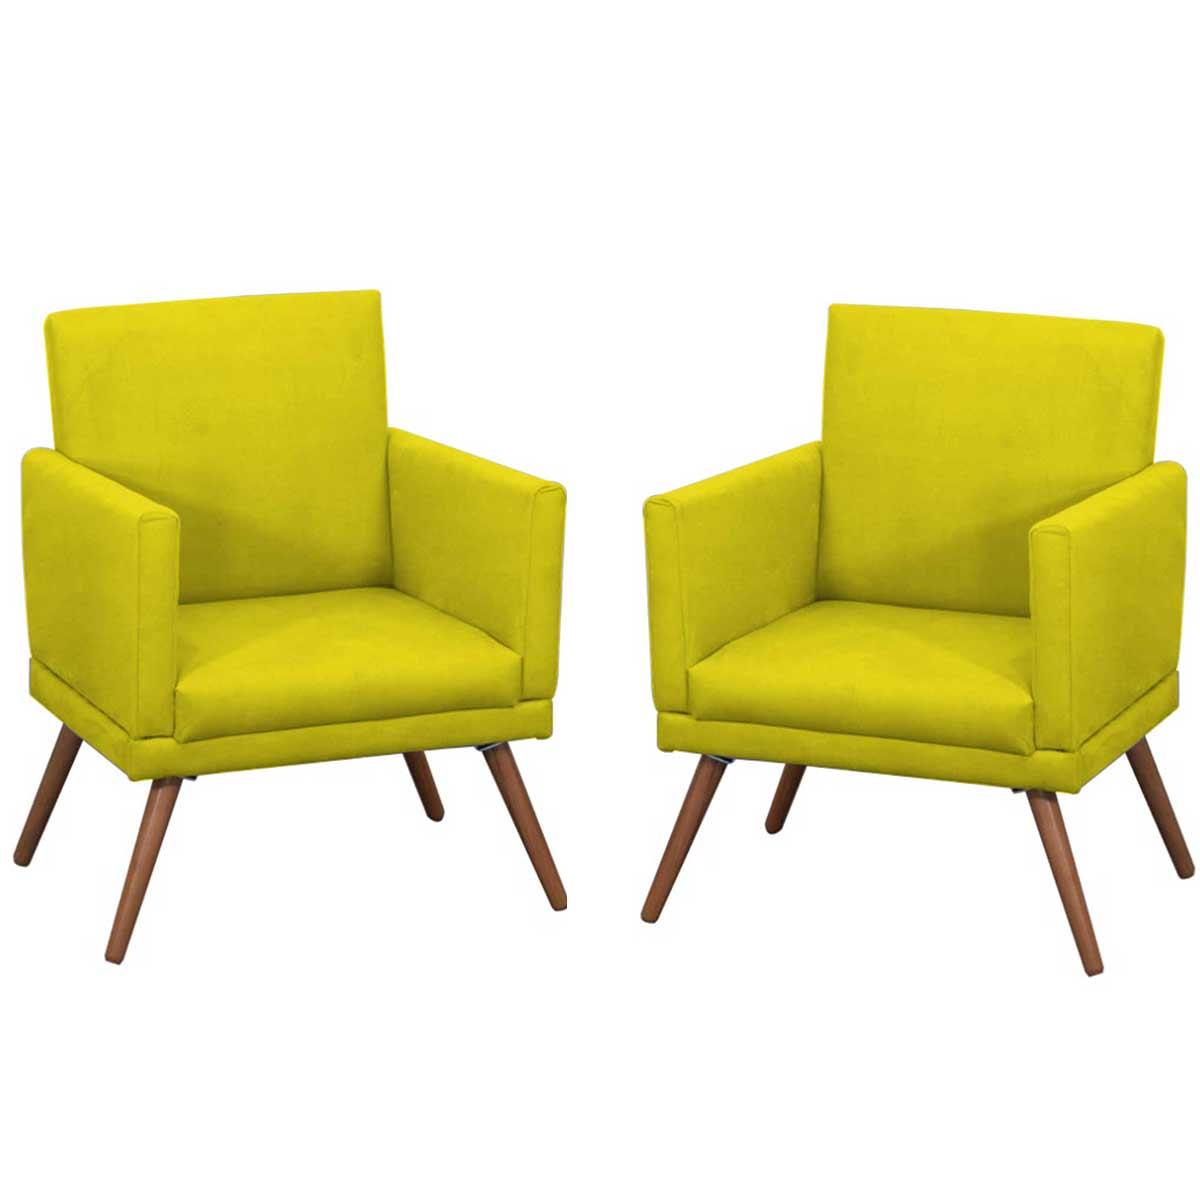 Kit 2 Poltronas Decorativas New Nina Pé Palito Suede Amarelo